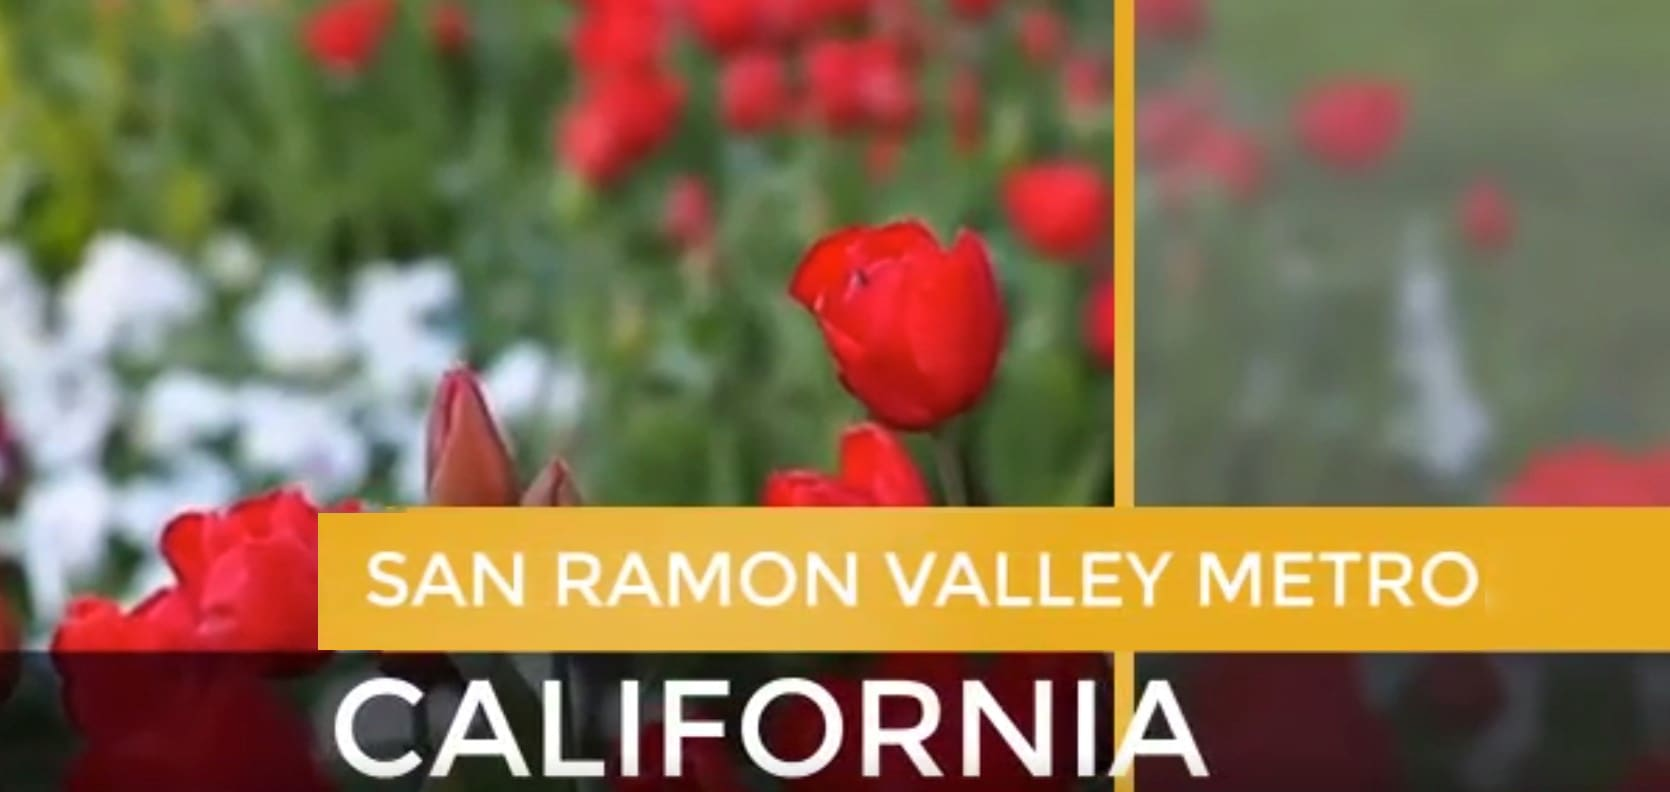 San Ramon Valley Metro video preview